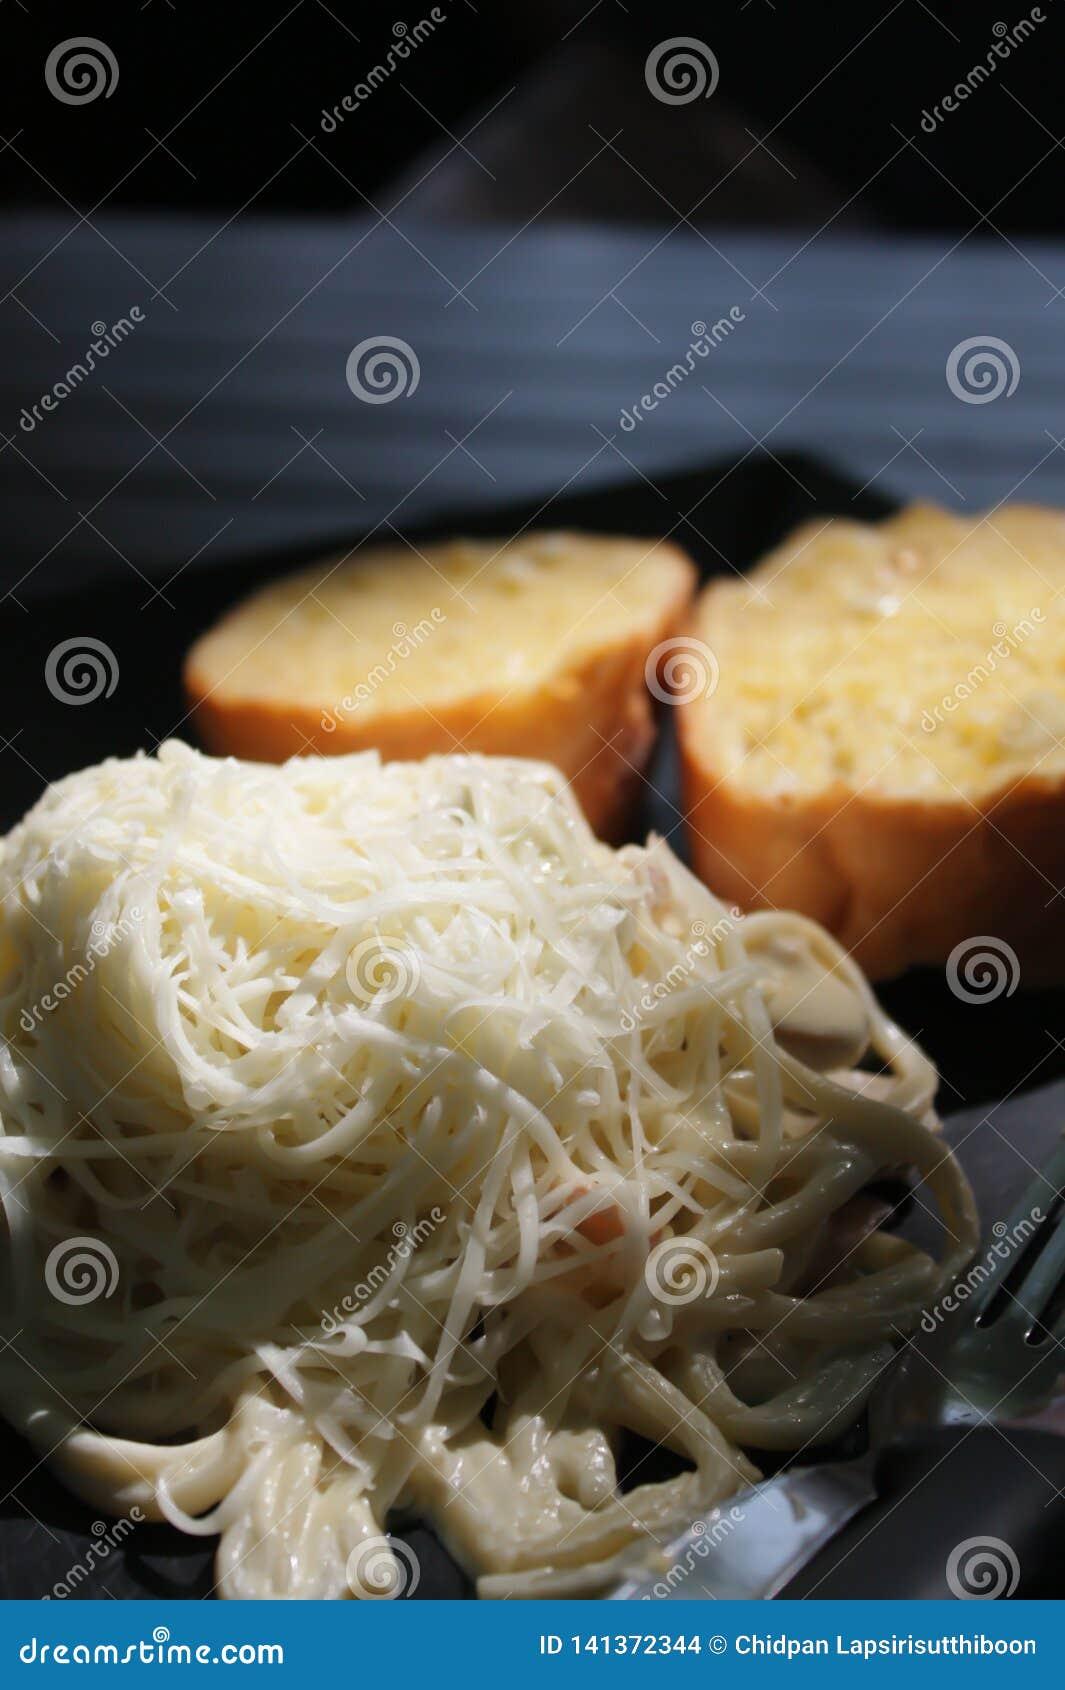 De spaghetti met witte saus, ham en paddestoelen met kaas en knoflookbrood wordt bedekt diende op een zwarte plaat die